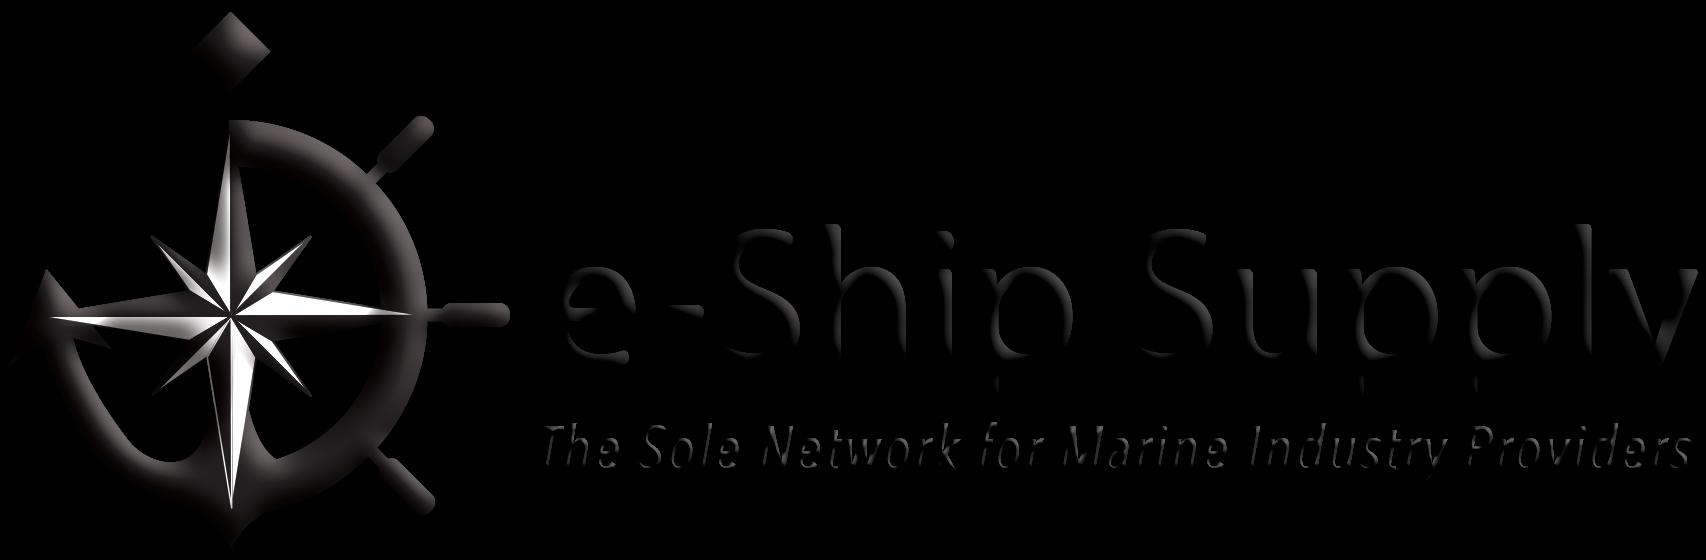 e-Ship Supply - Worldwide Marine Supplies at All Ports